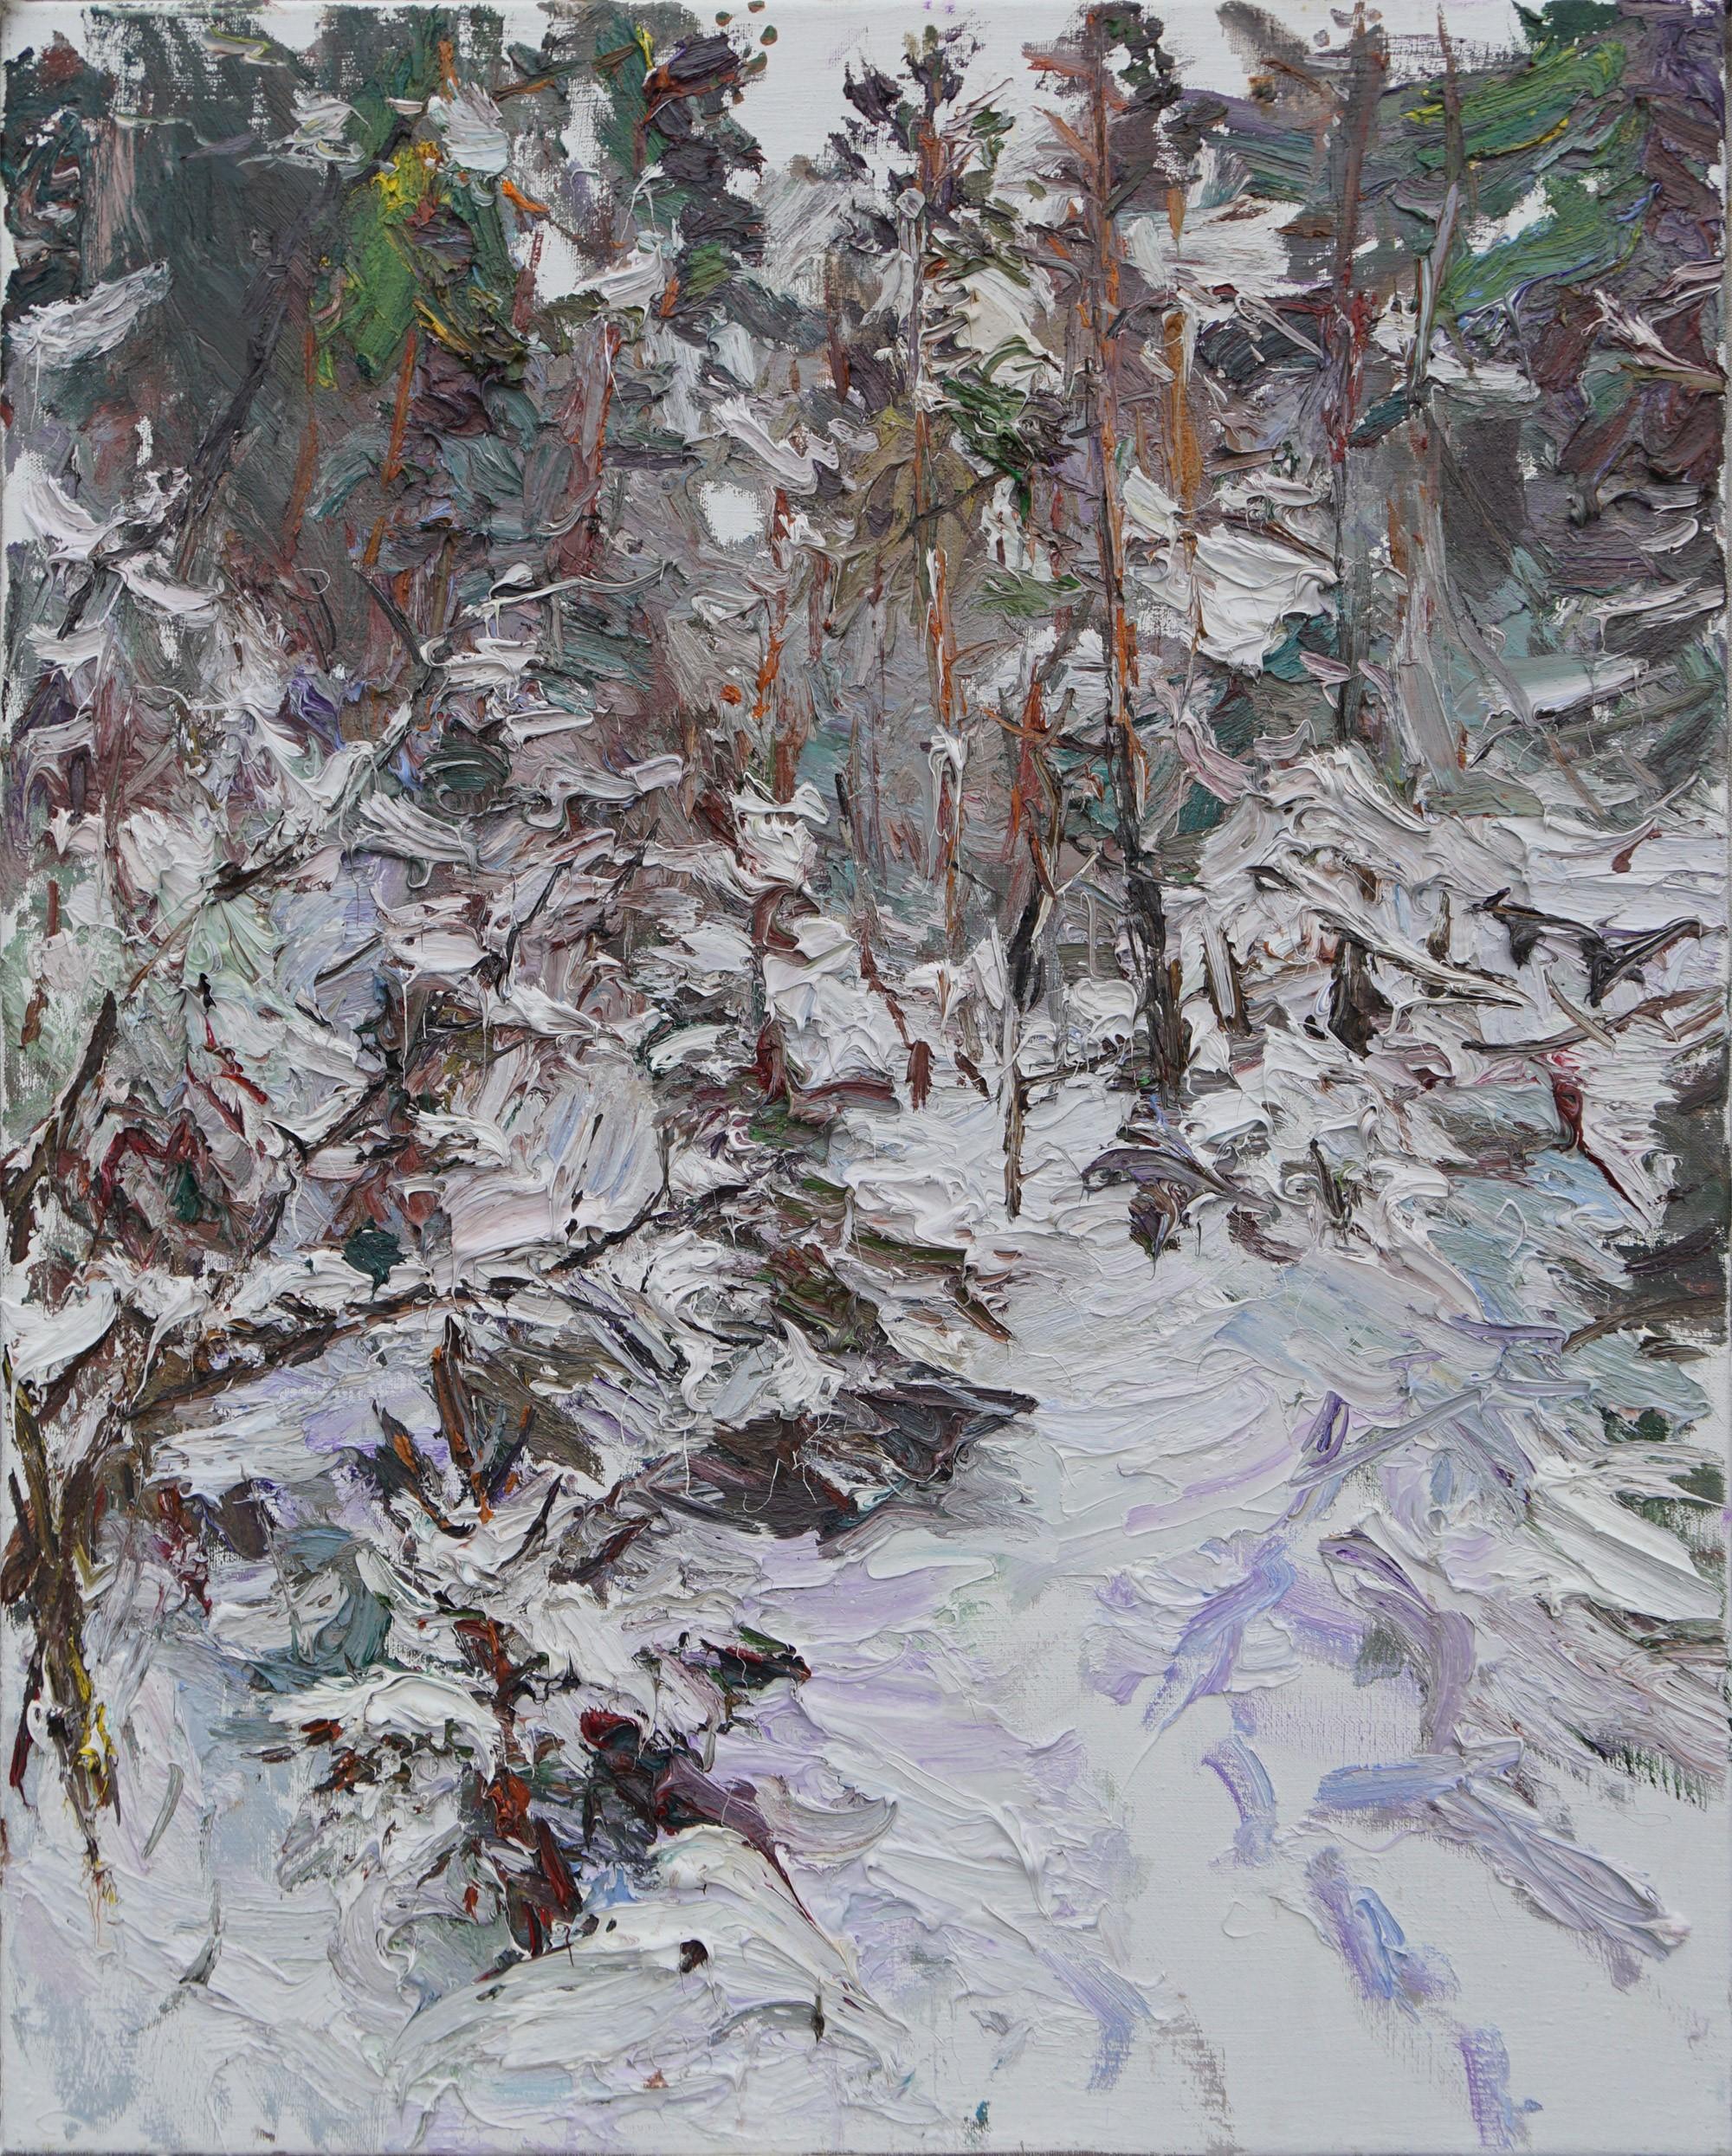 Heavy Snow, Karelia by Ulrich Gleiter